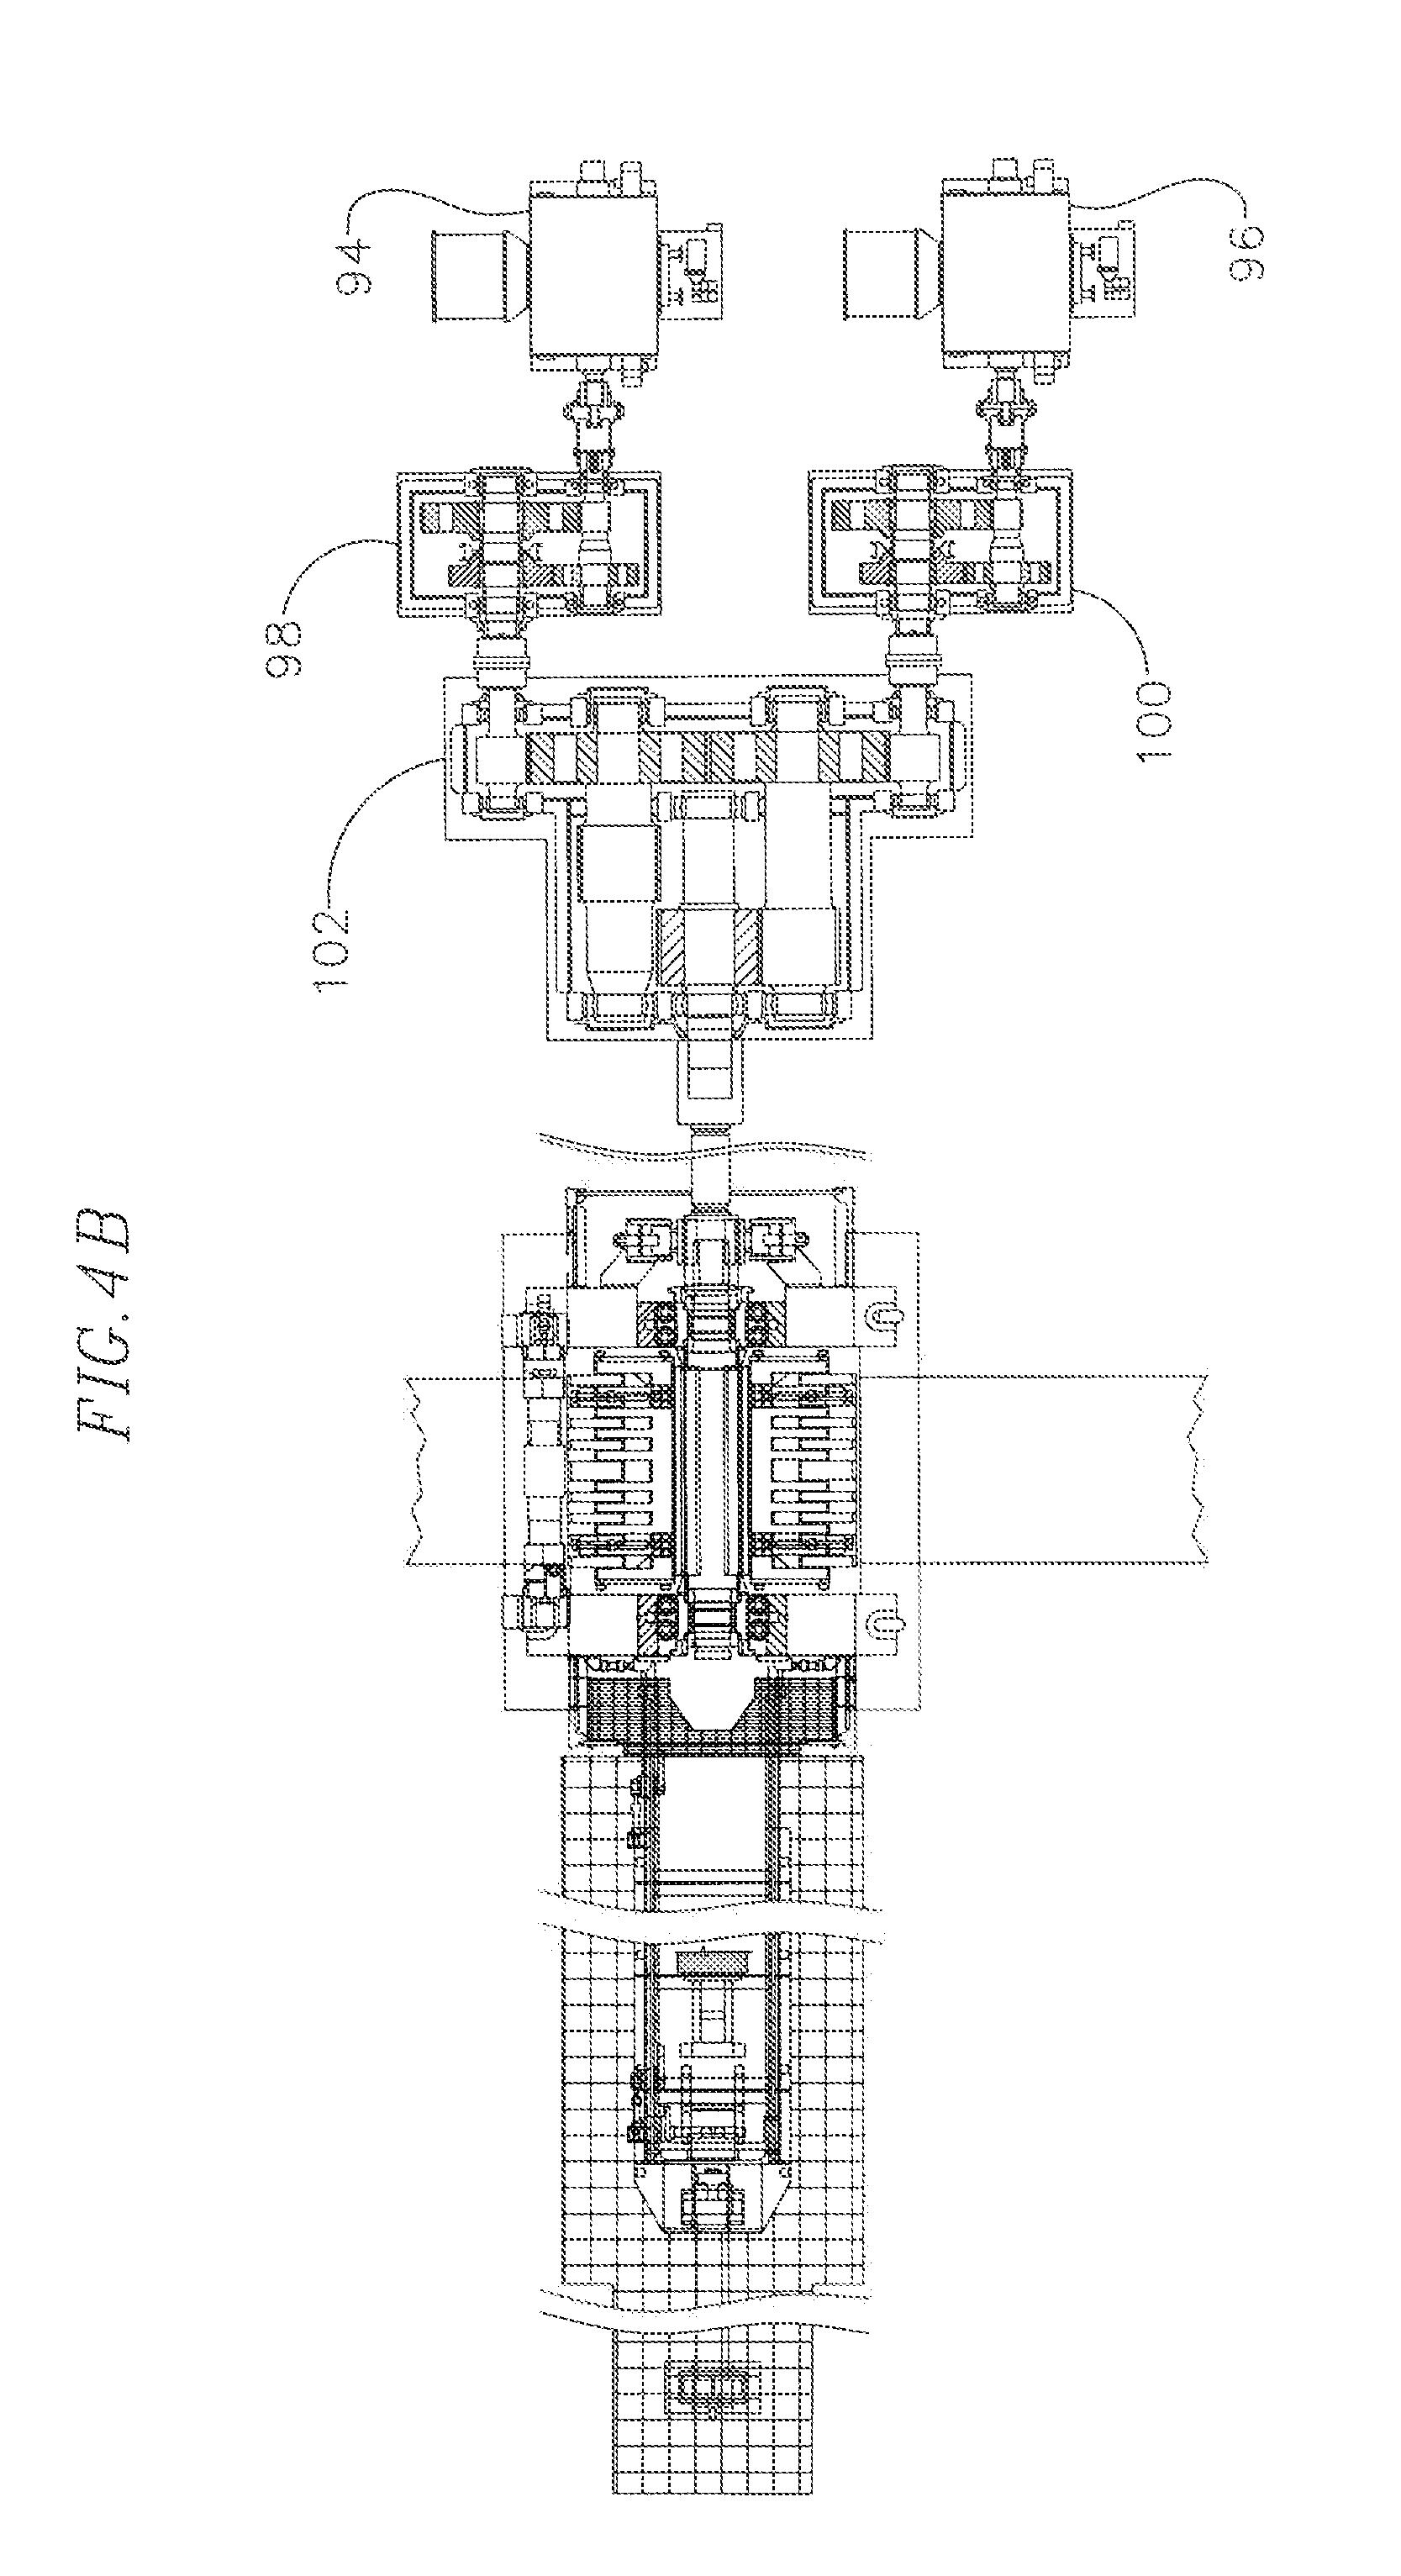 Kawasaki Waverunner Engine Diagram